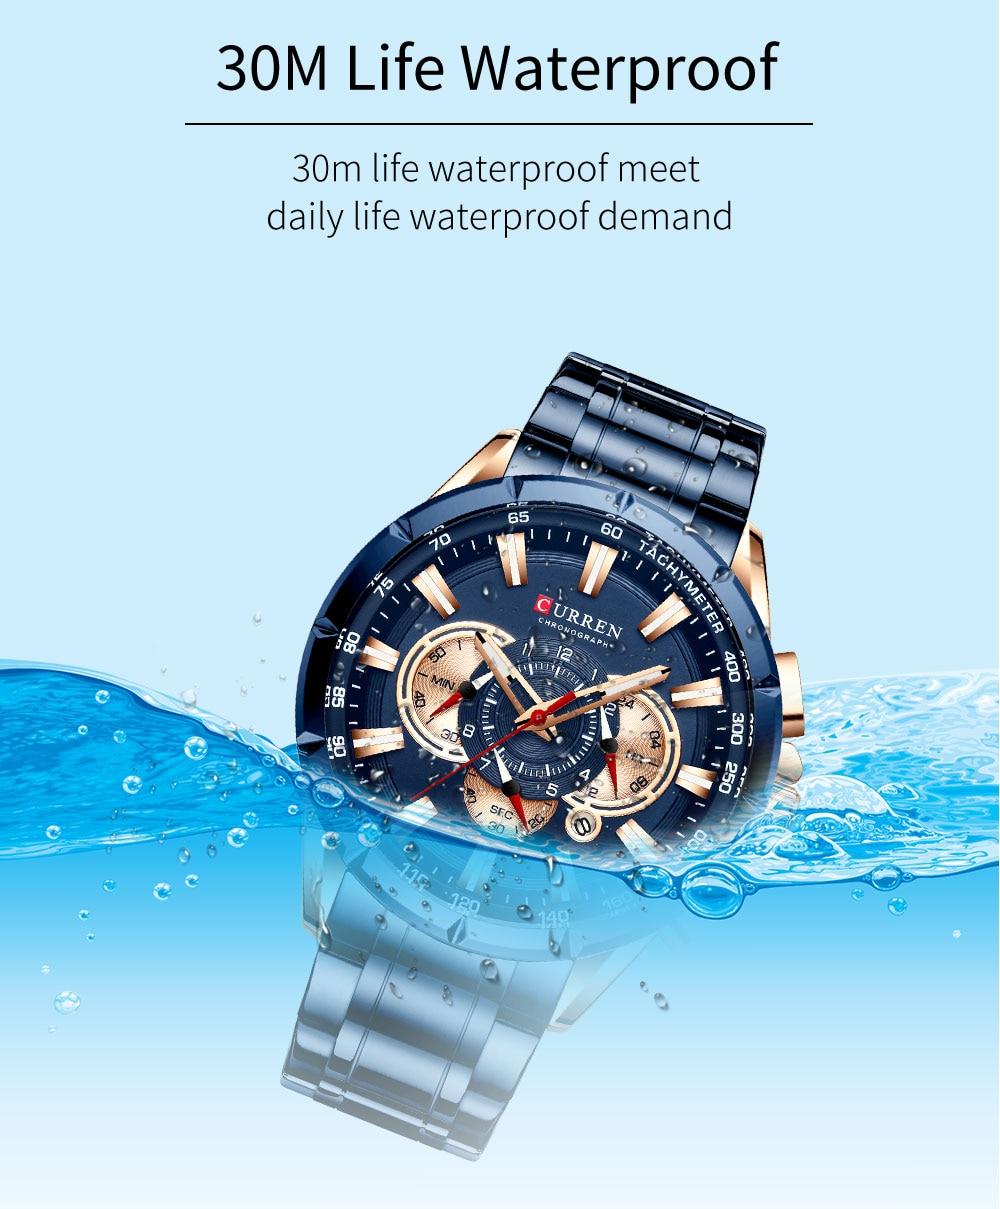 H481d2a2df4154deaa00d102d4972dc377 CURREN Wrist Watch Men Waterproof Chronograph Military Army Stainless Steel Male Clock Top Brand Luxury Man Sport Watches 8363